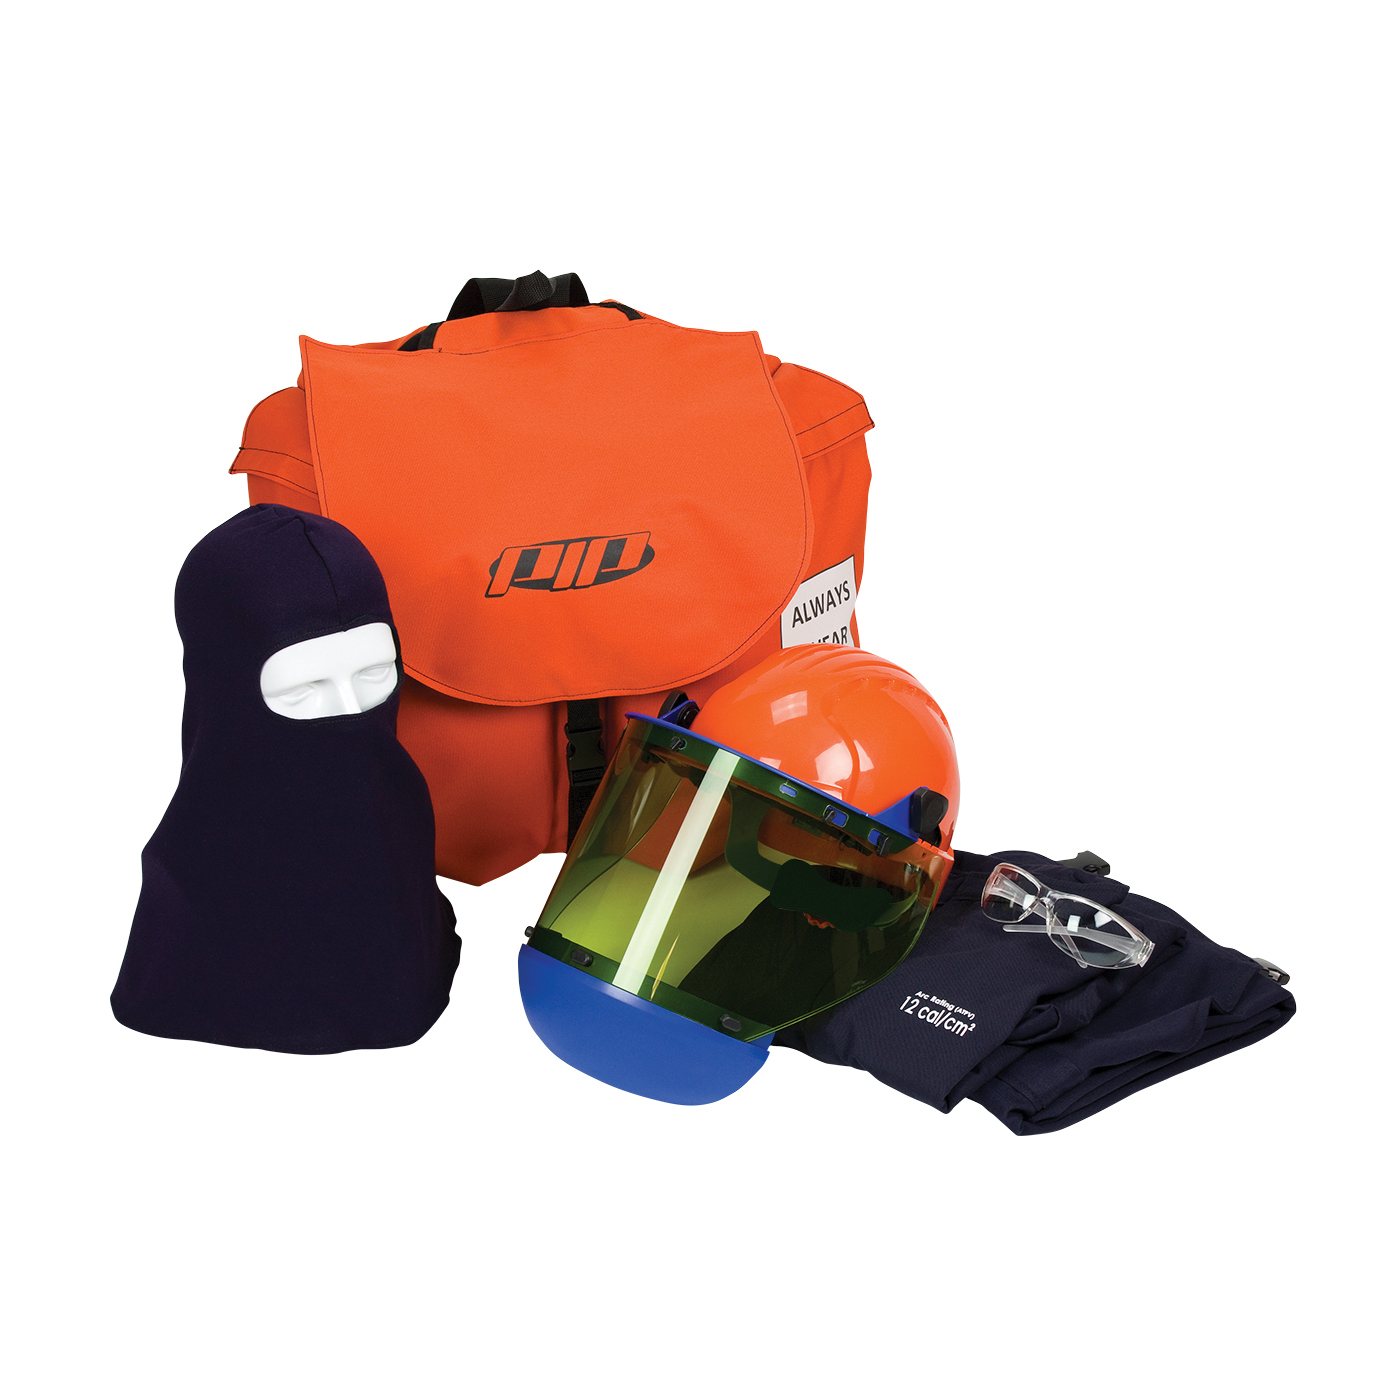 CESG by PIP® 9150-53887/L Arc Flash Kit, Hazard Risk Category (HRC): HRC 2, Hood/Face Shield Max Arc Flash Protection: 12 cal/sq-cm, Garment Max Arc Flash Protection: 12 cal/sq-cm, ASTM F1506, Arc Hood/Hard Hat Head/Face Protection, L